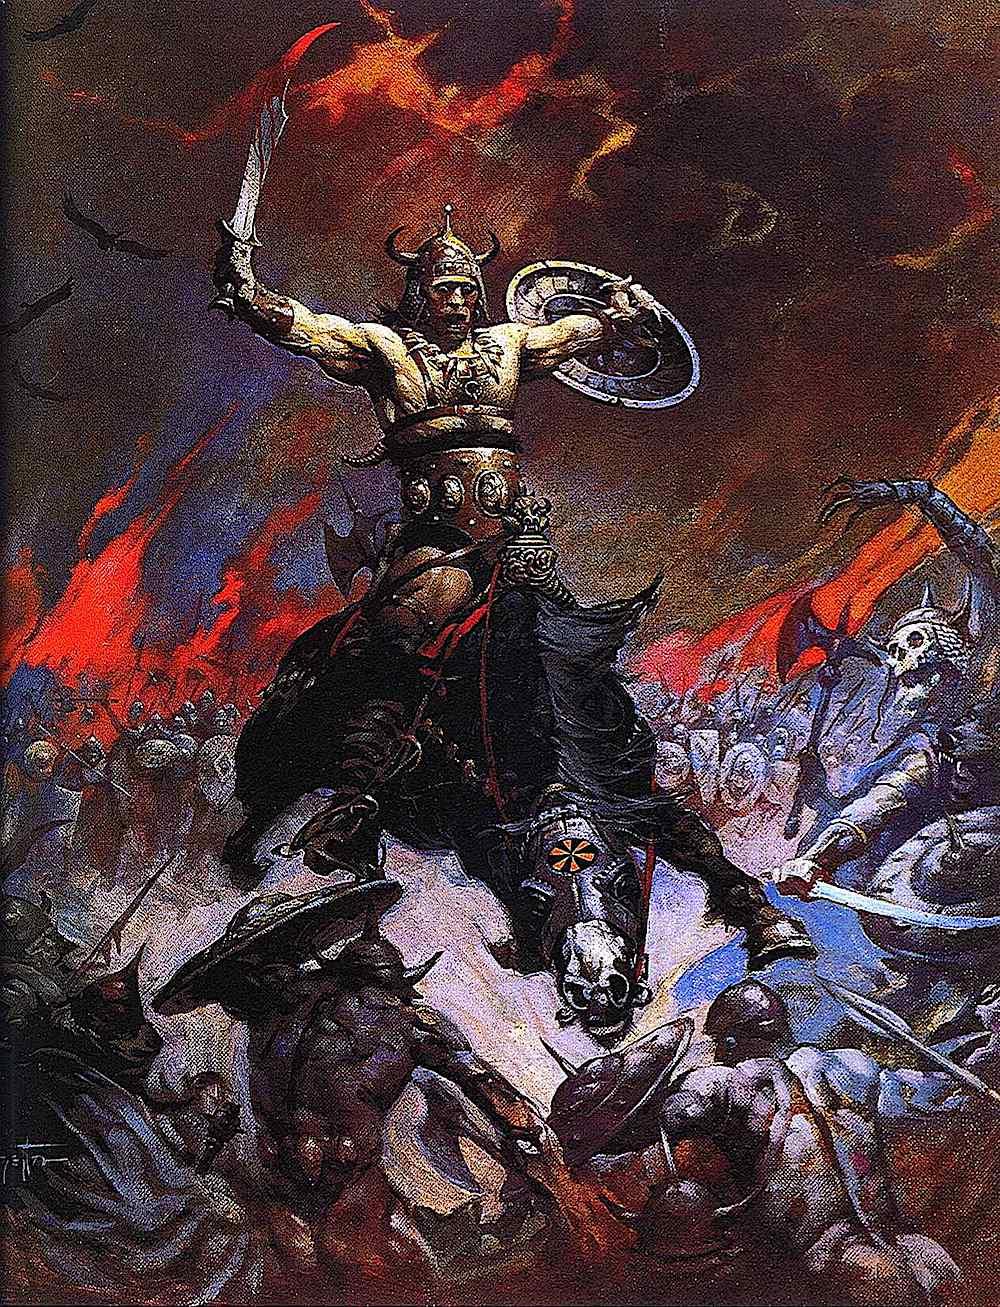 an illustration by Frank Frazetta of battle insanity